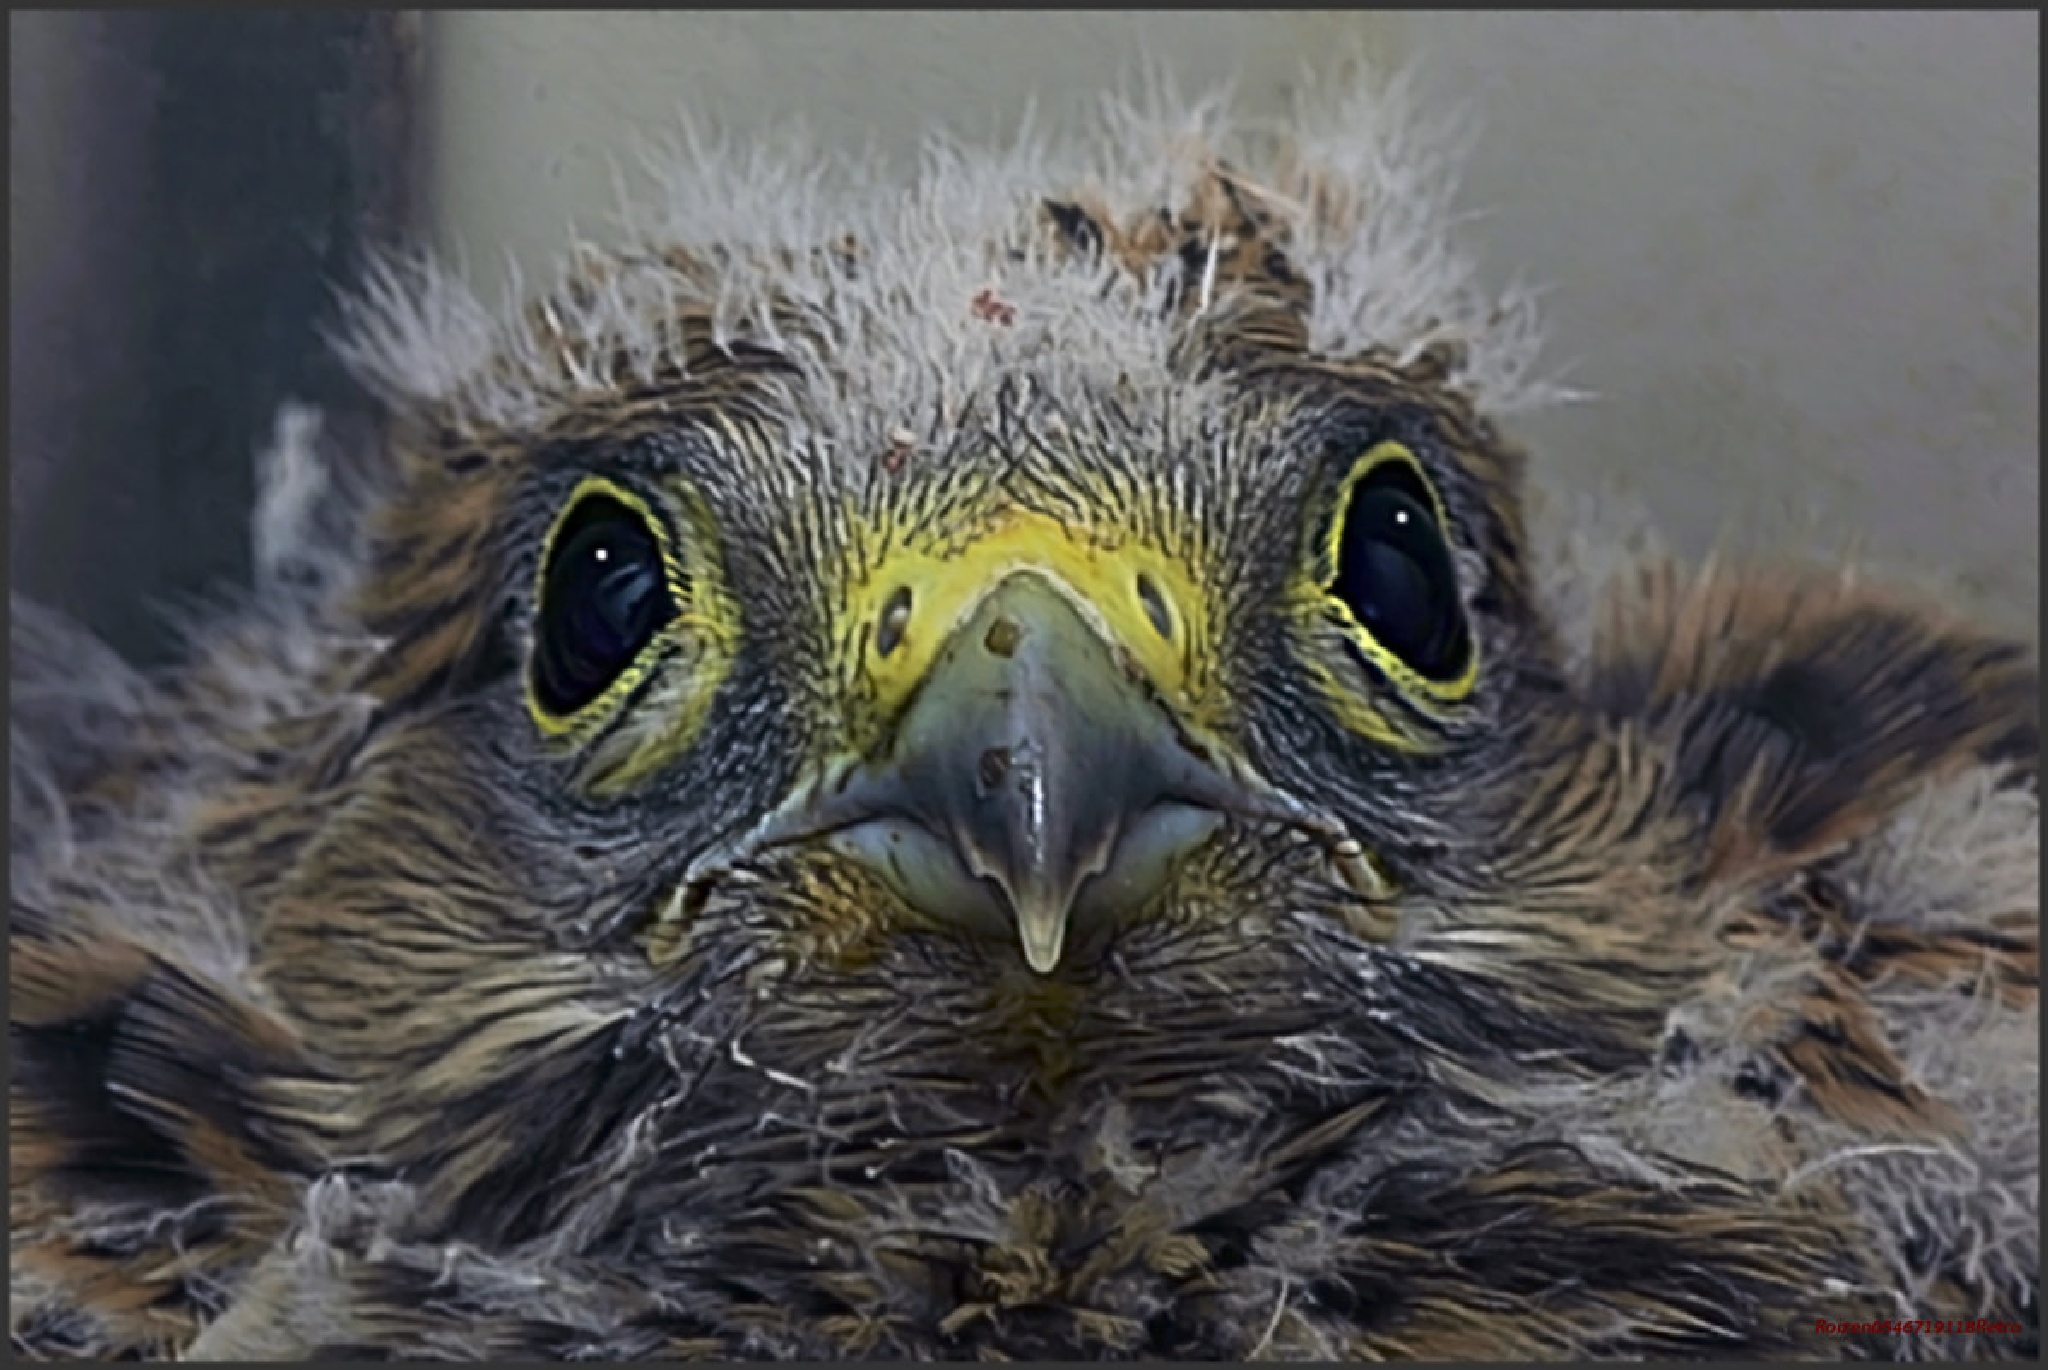 kestrel chick portrait by SHMUAL HAVA RETRO